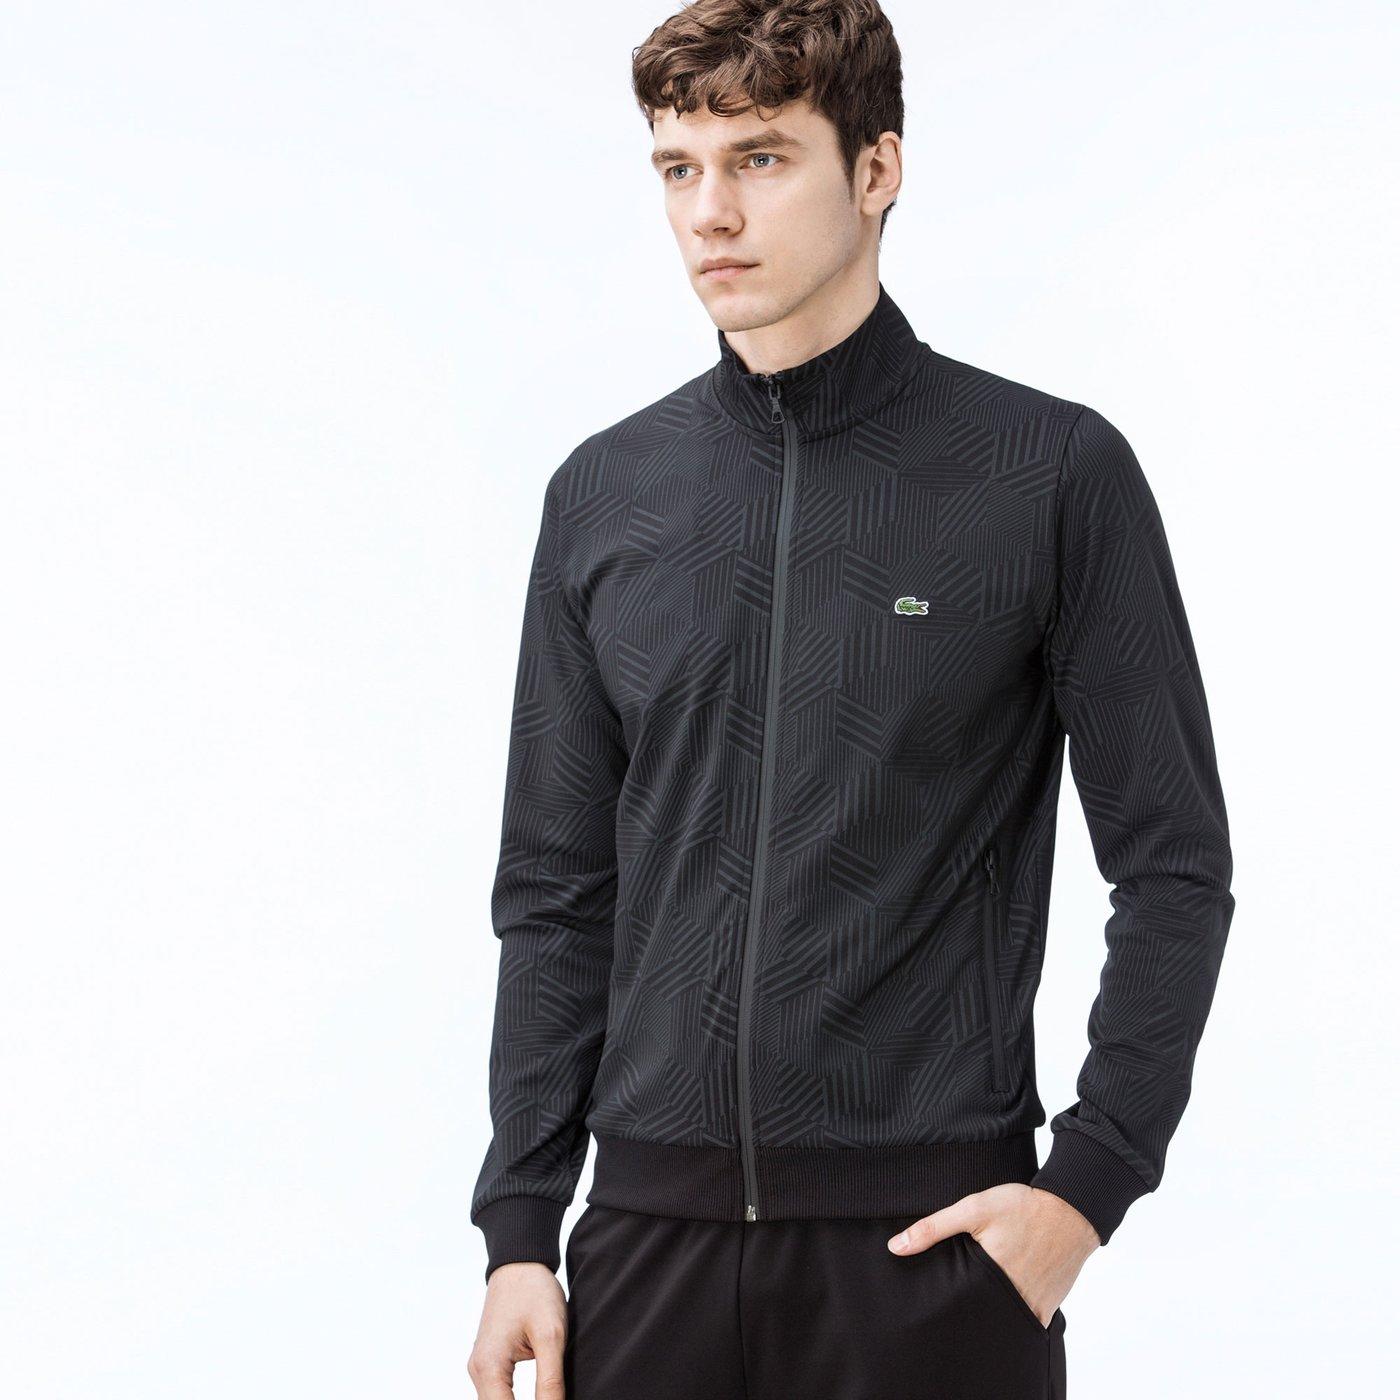 Lacoste Erkek Siyah Fermuarlı Sweatshirt